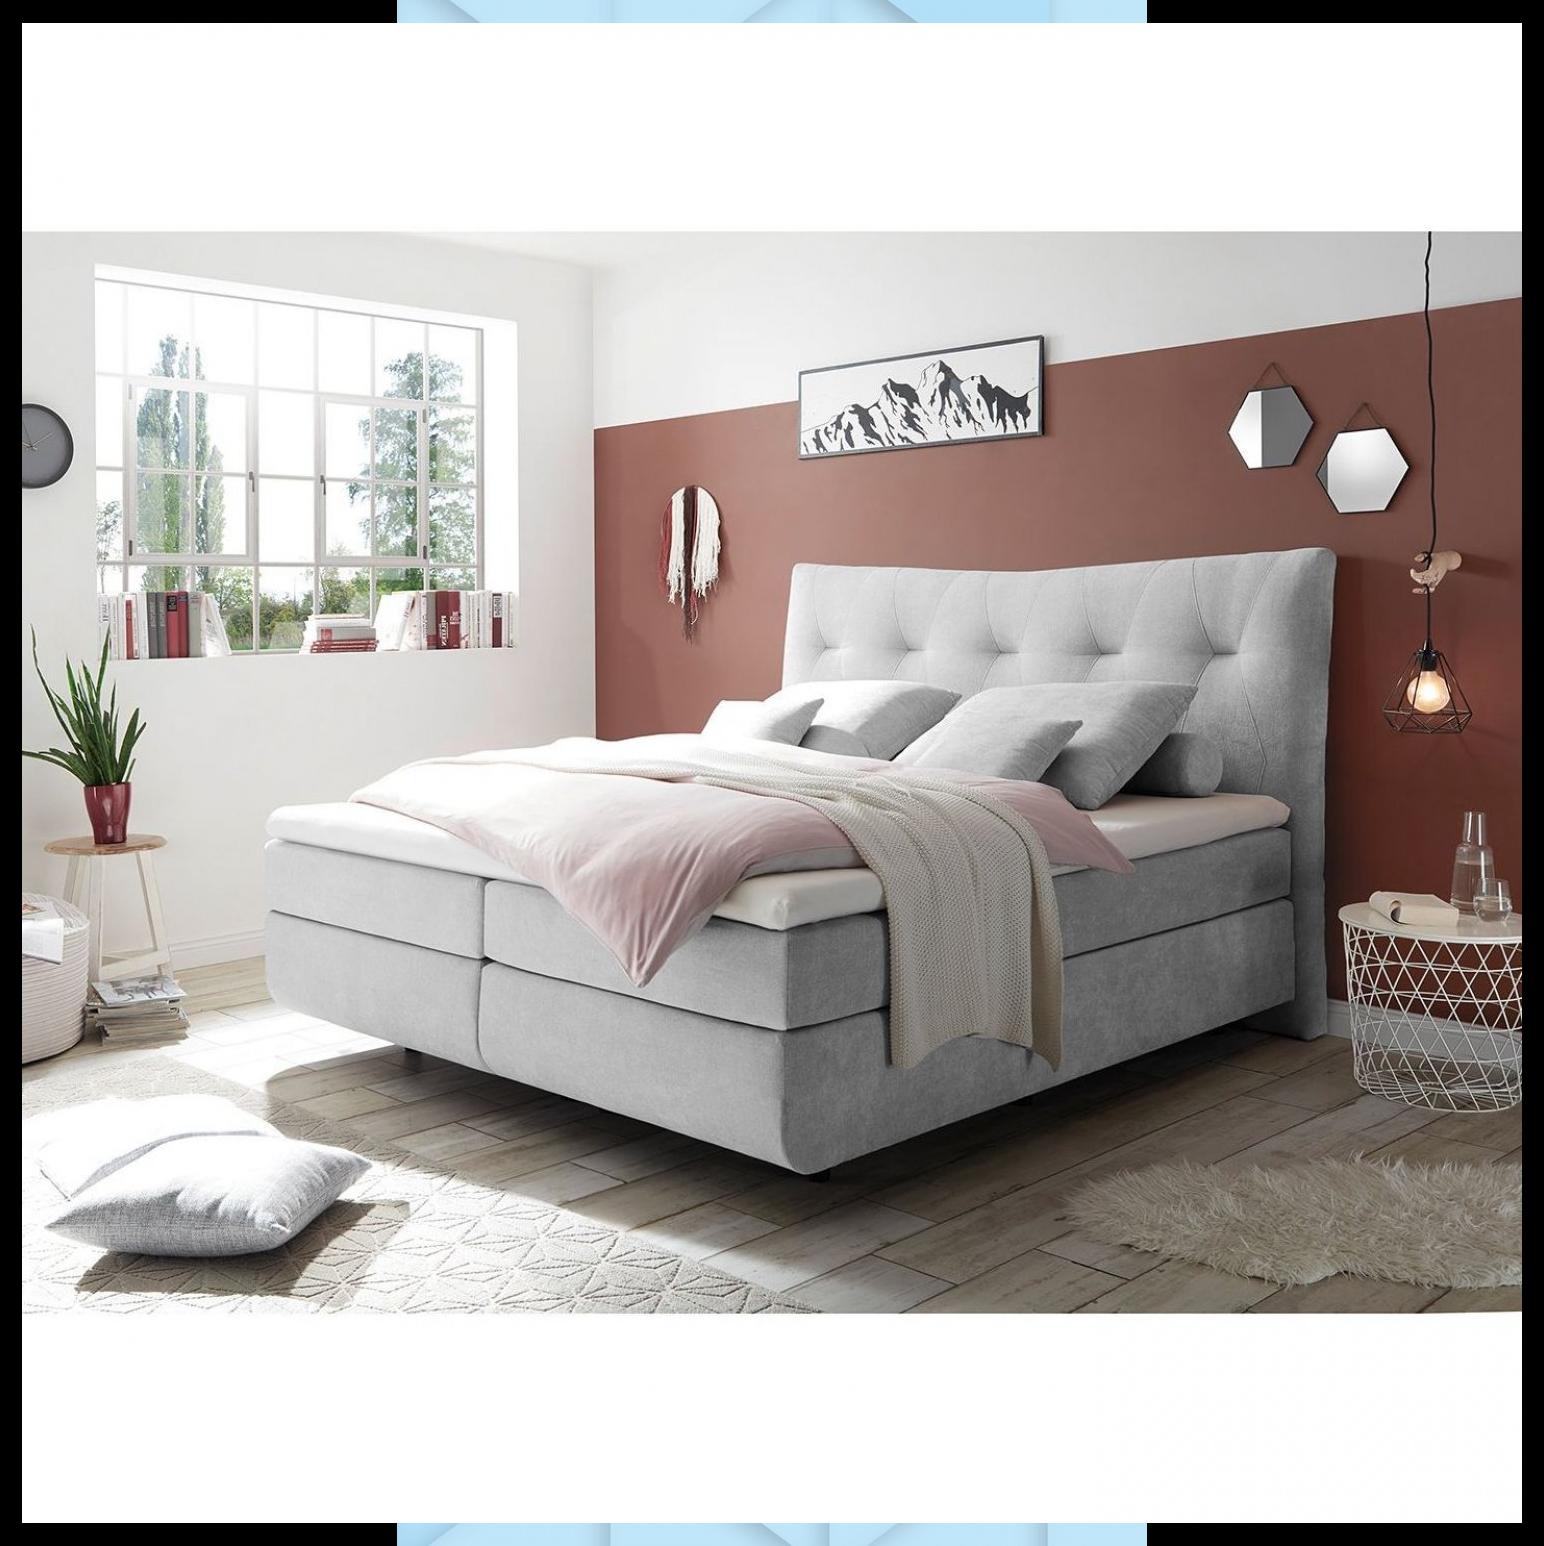 Fredriks Boxspringbett Tibery 180x200 Cm Synthetikfaser Silber Mit Matratze Topper In 2020 Remodel Bedroom Small Bedroom Remodel Cozy Dorm Room